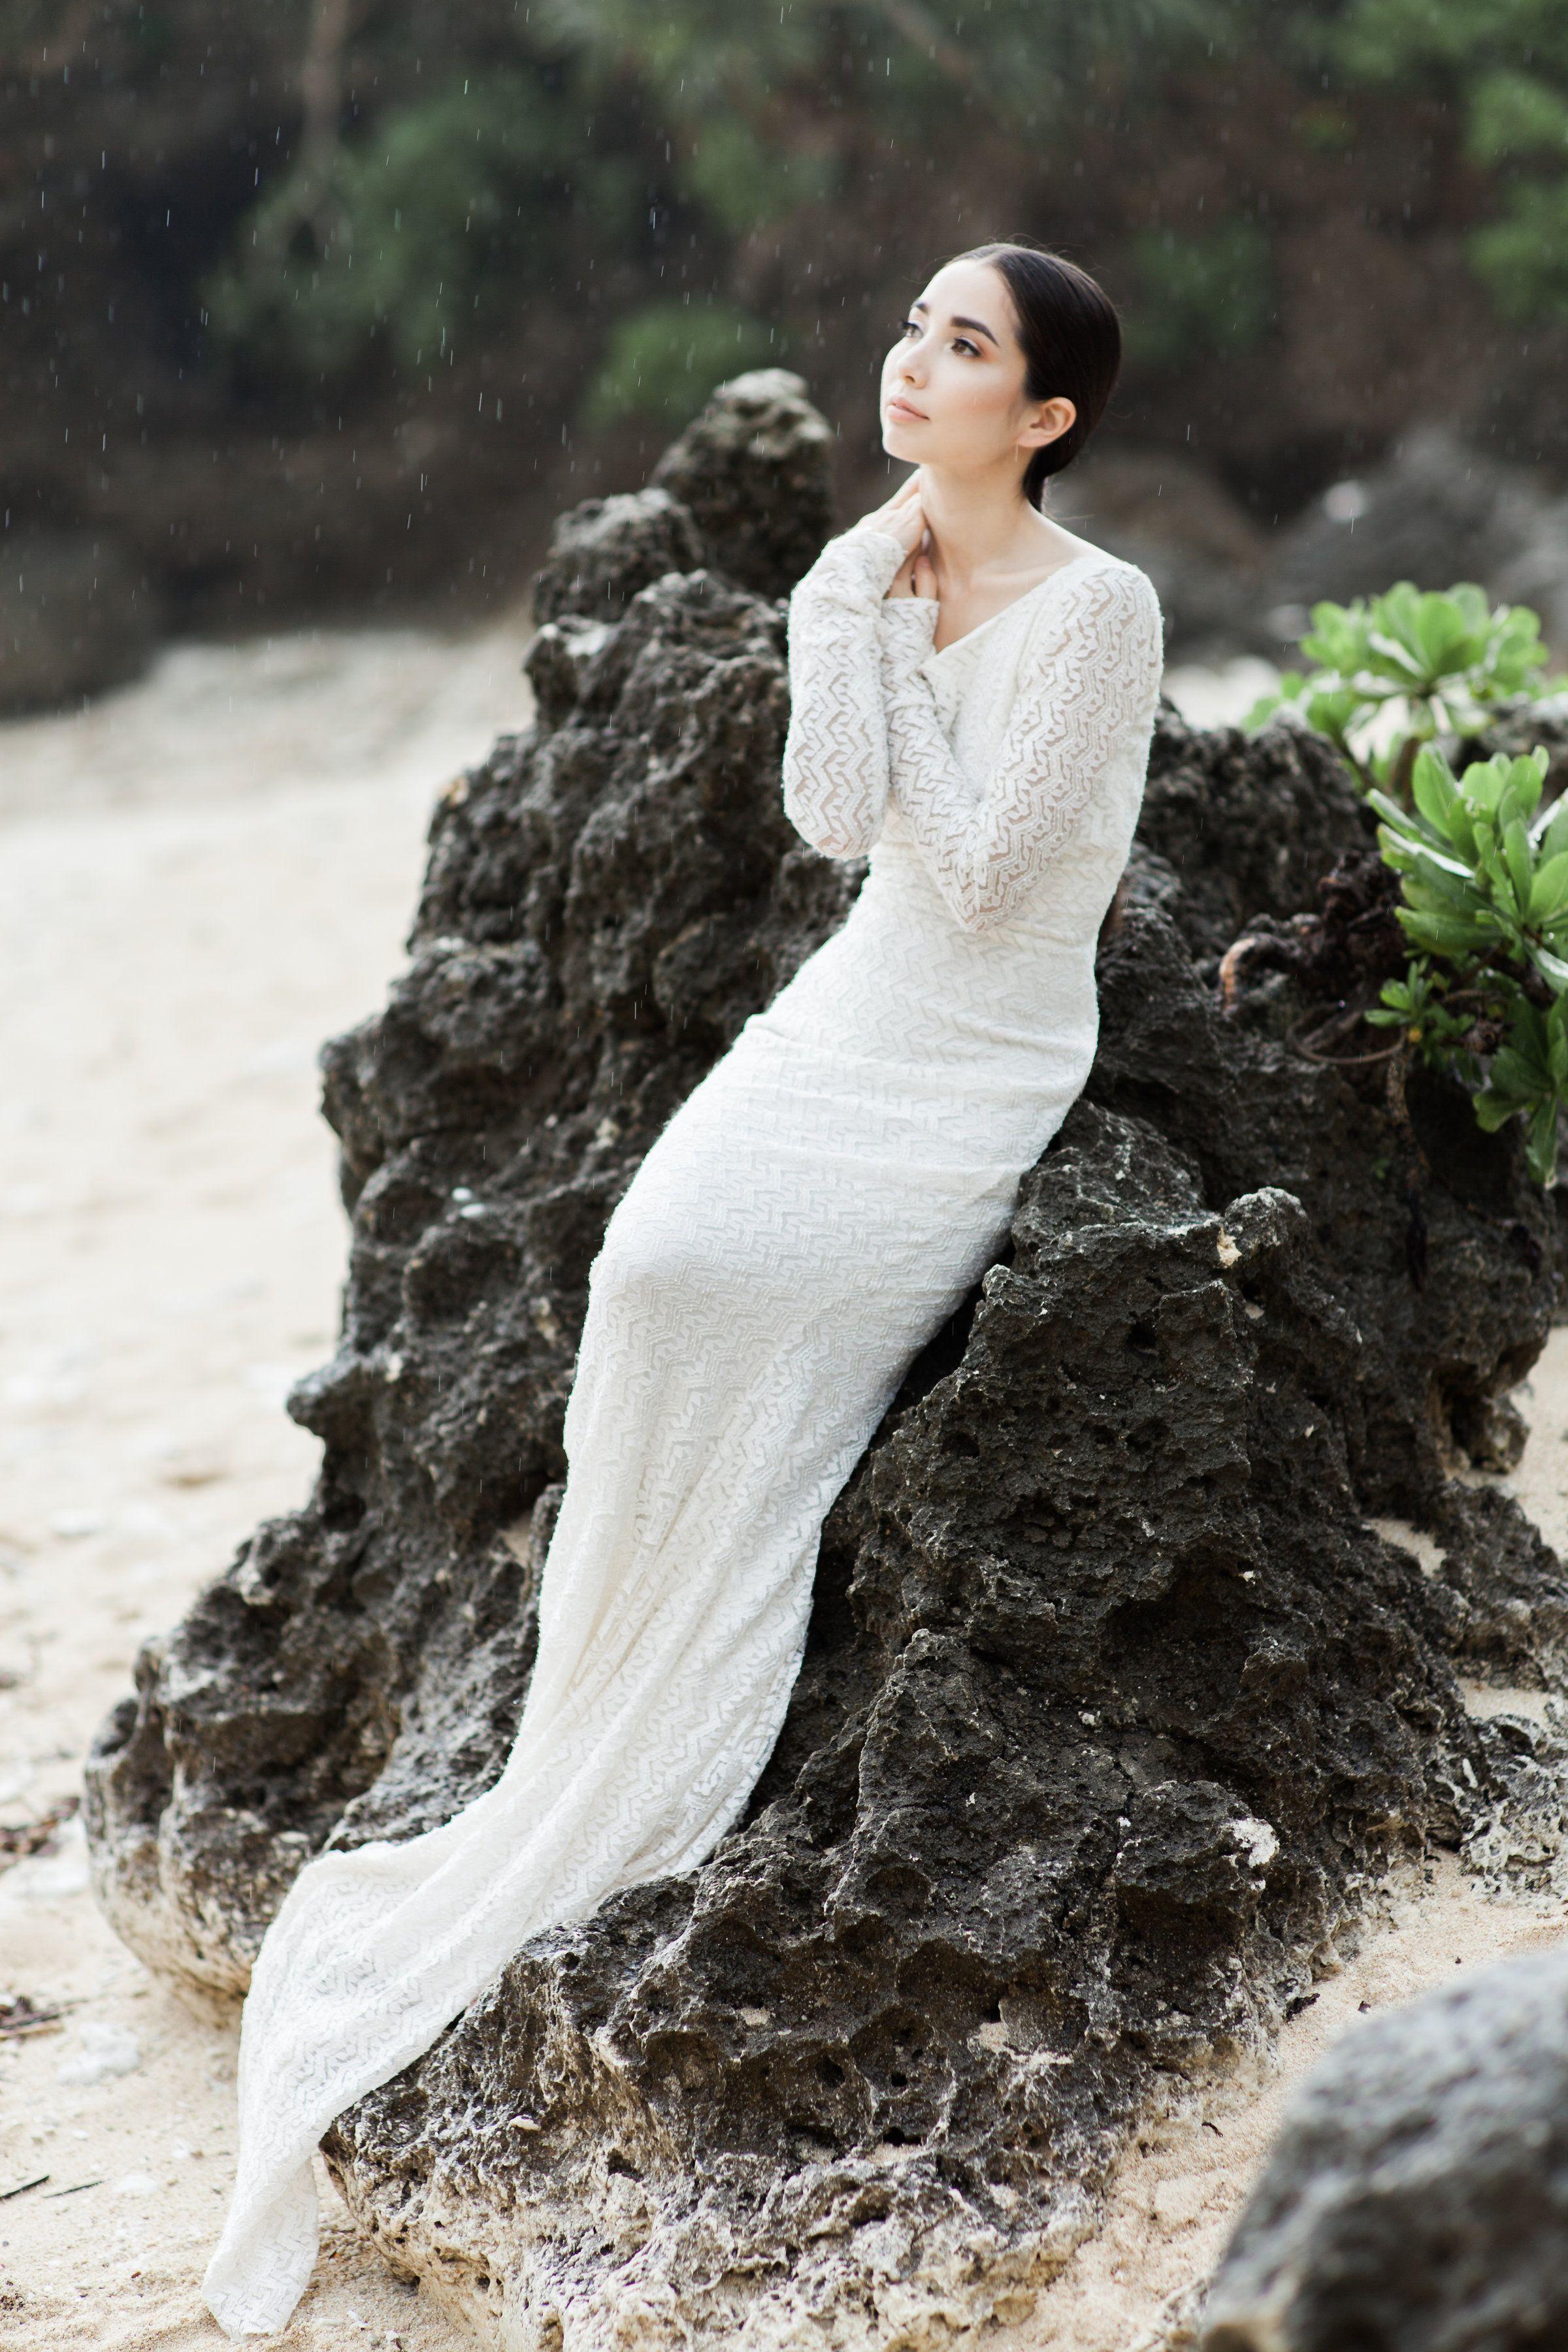 House Of Moirai Jane Dress Bride Bohemian Wedding Japan Weddingdress White Boho Hom Bridal Lace Dresses Boho Wedding Dress Wedding Dresses Lace